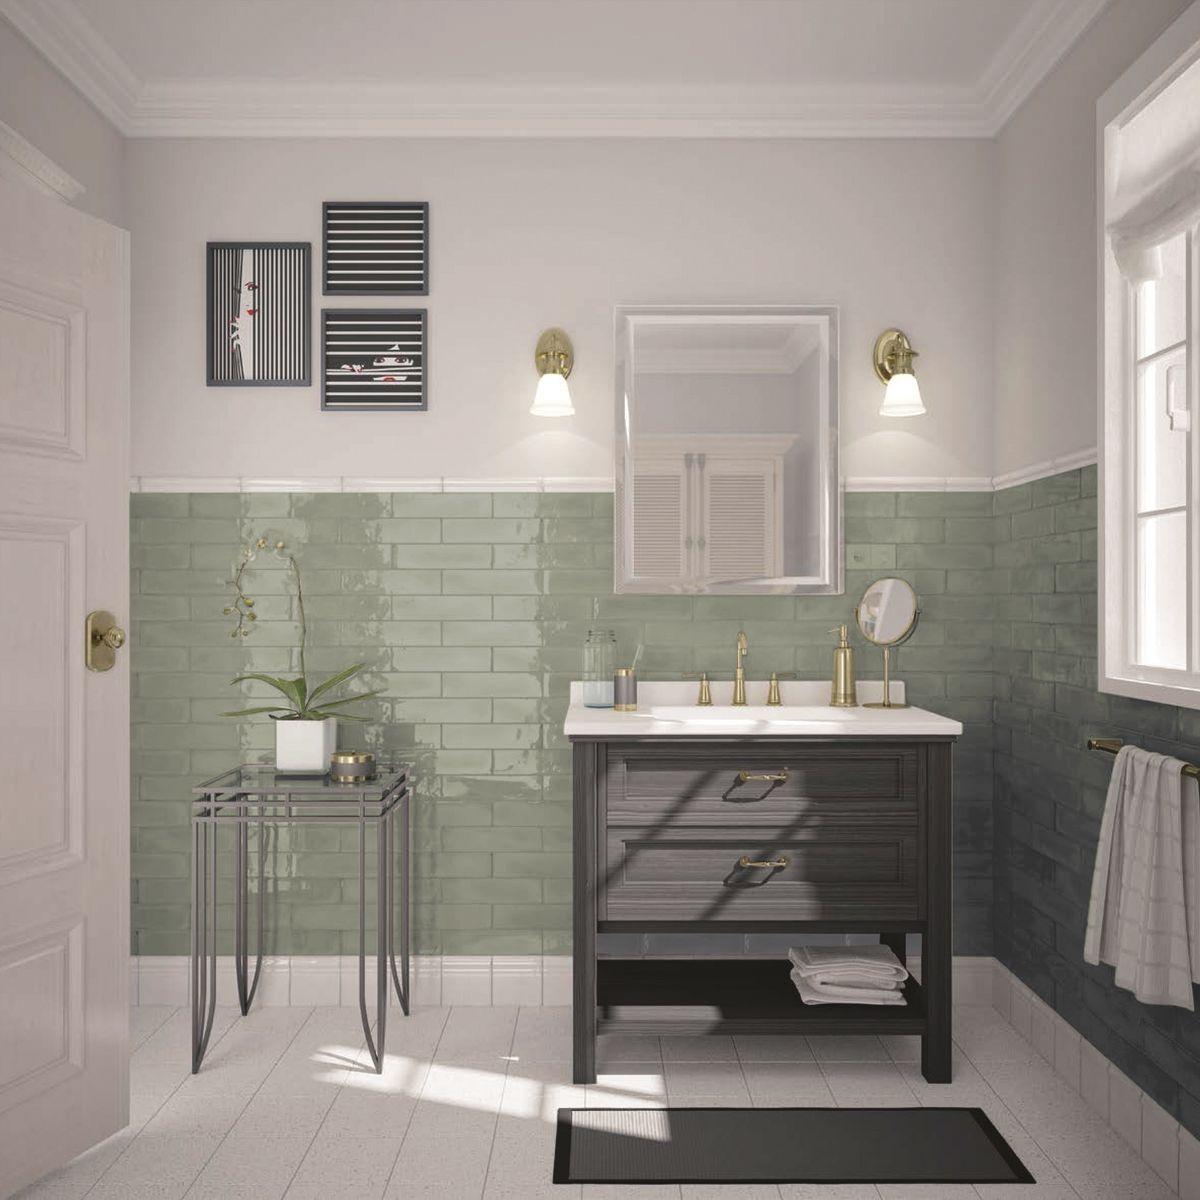 Before & After: A Beige Bathroom Gets A Deep Green Refresh ...